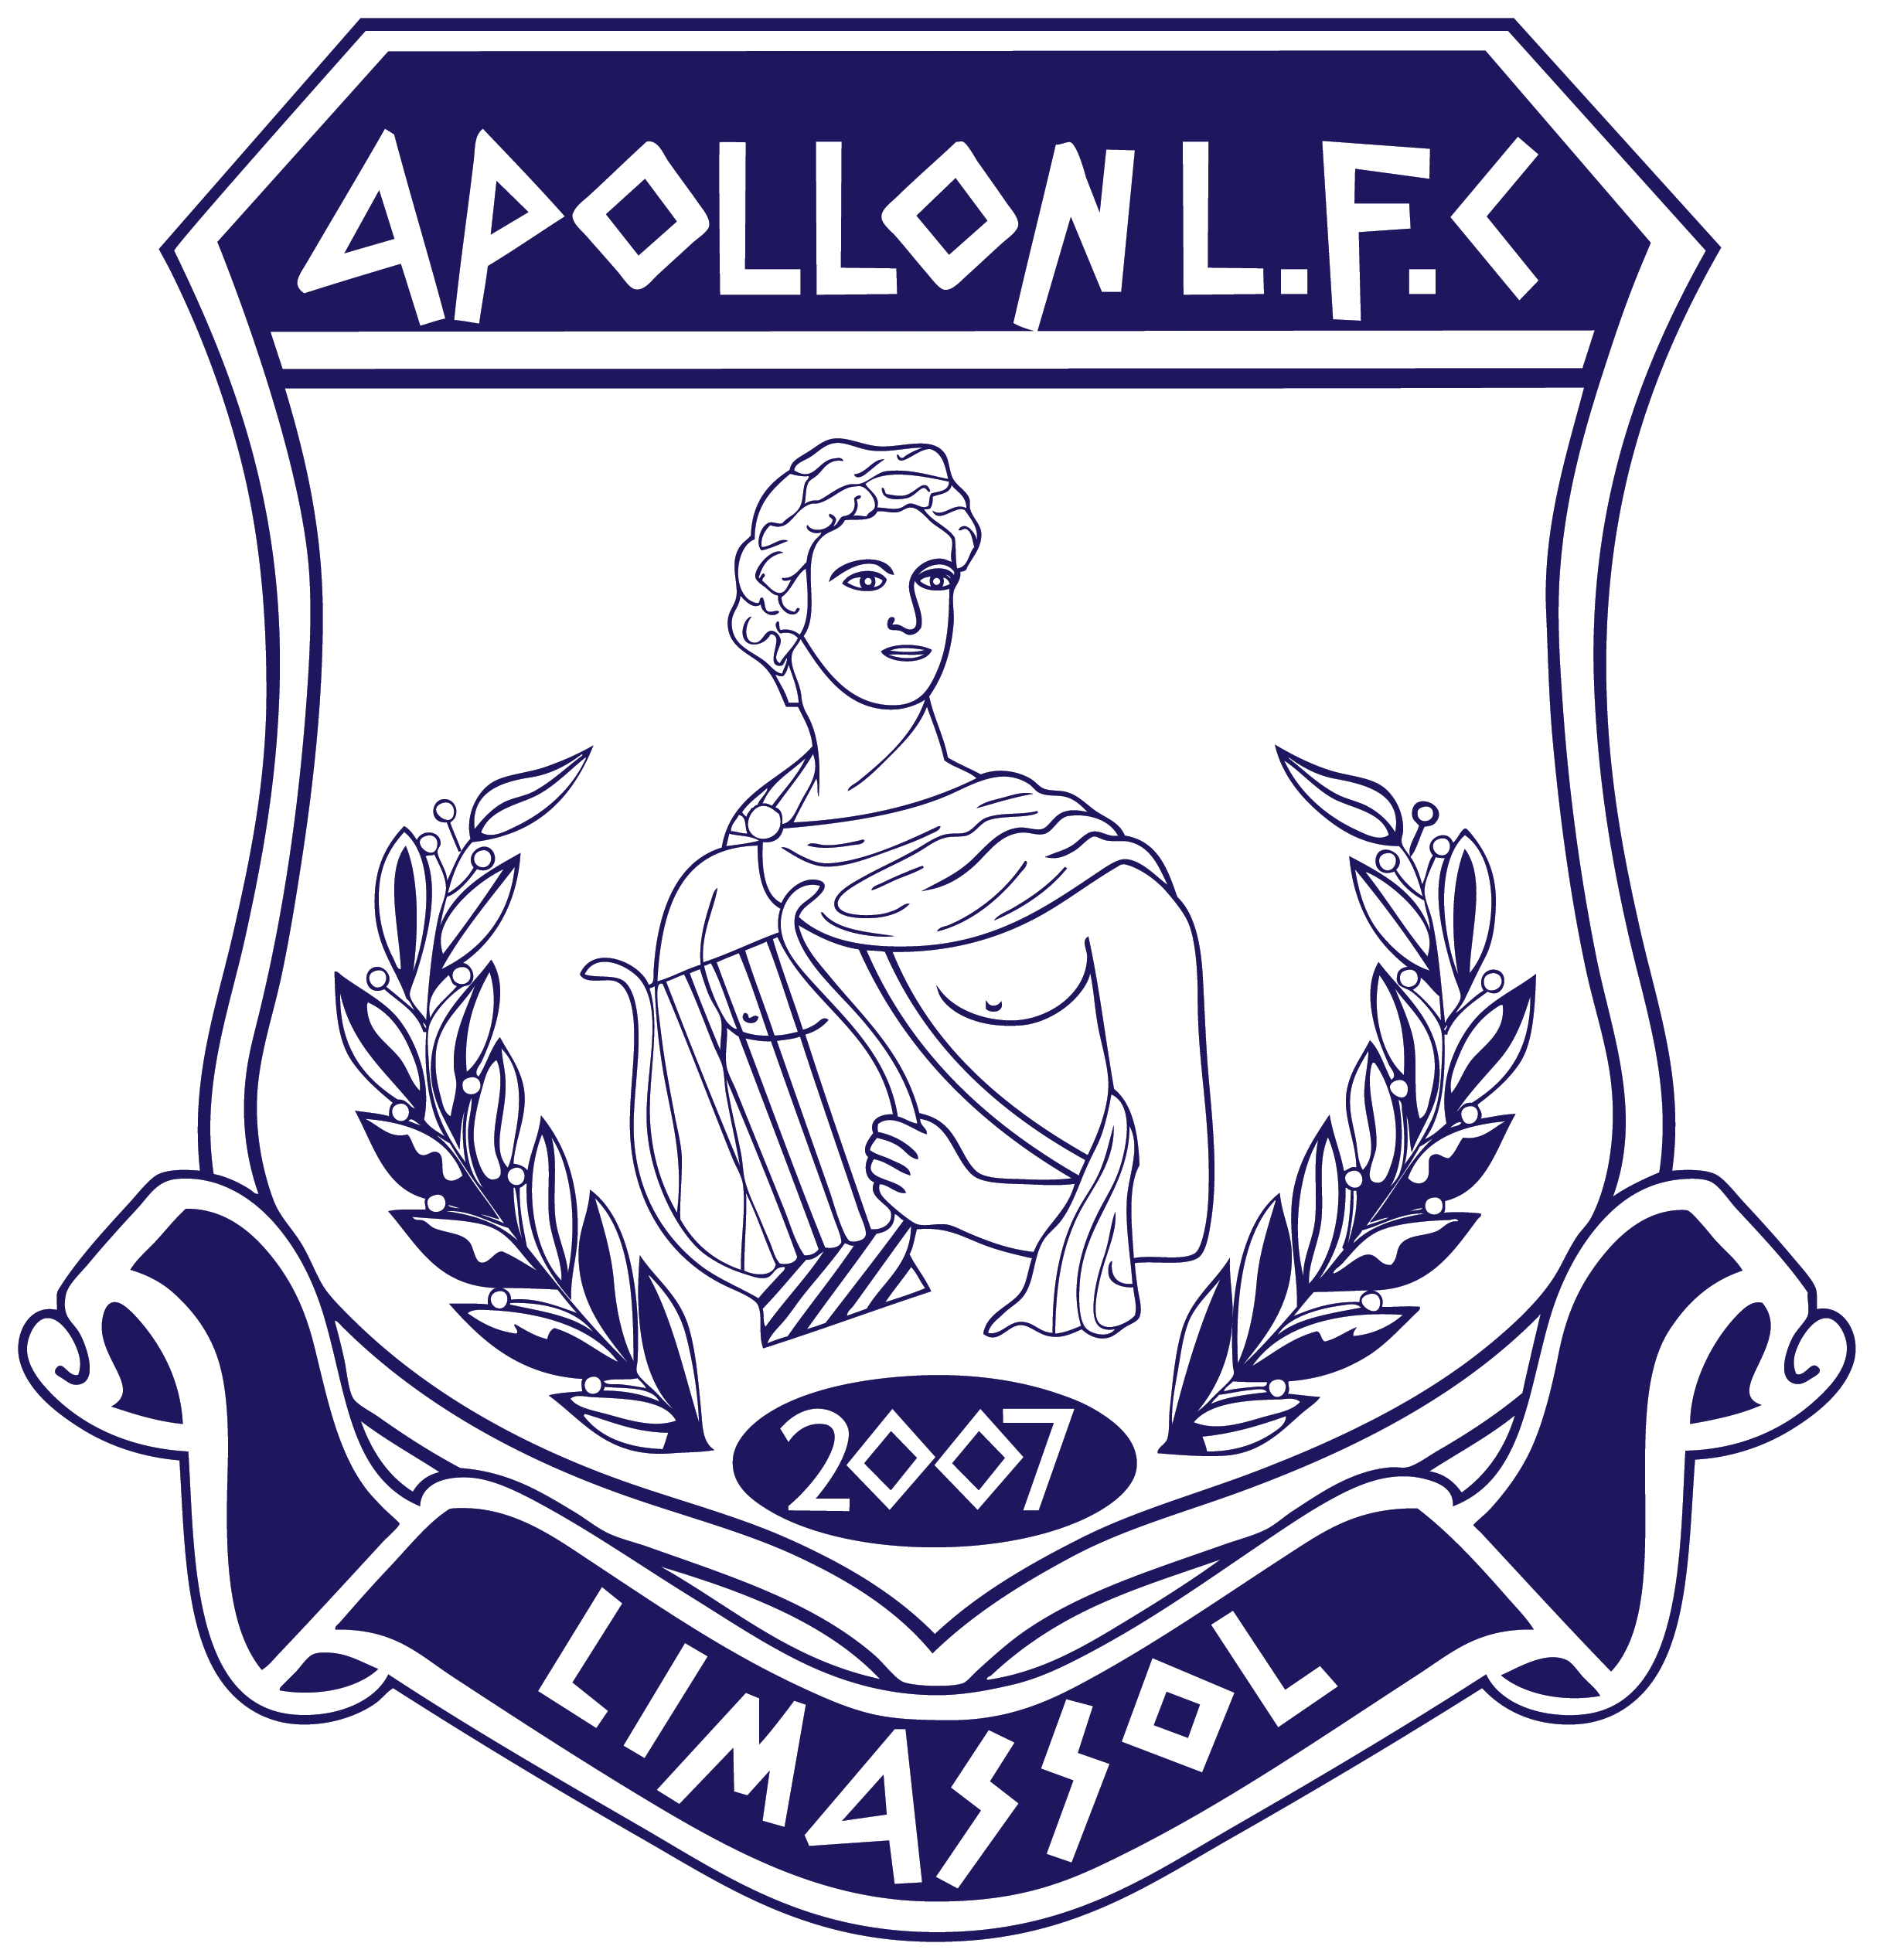 Imagen del escudo del Apollon de Limssol